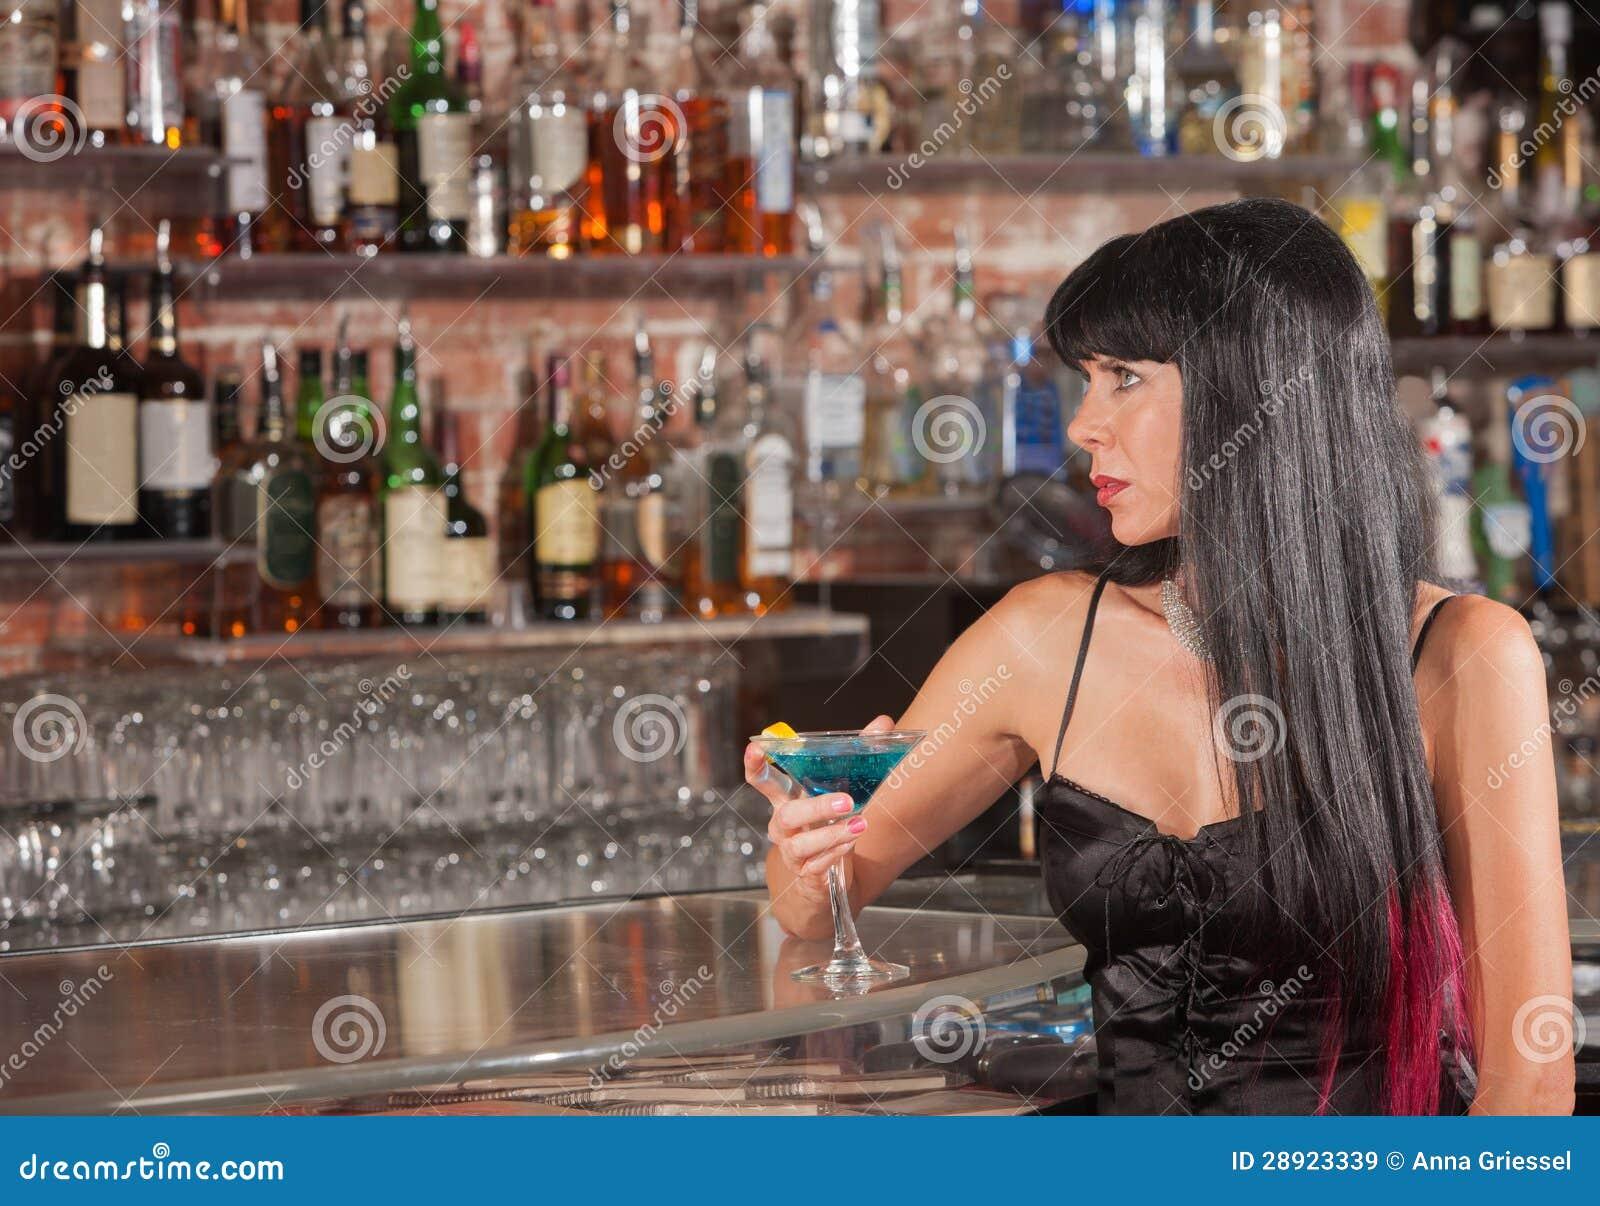 Снял в баре онлайн 6 фотография